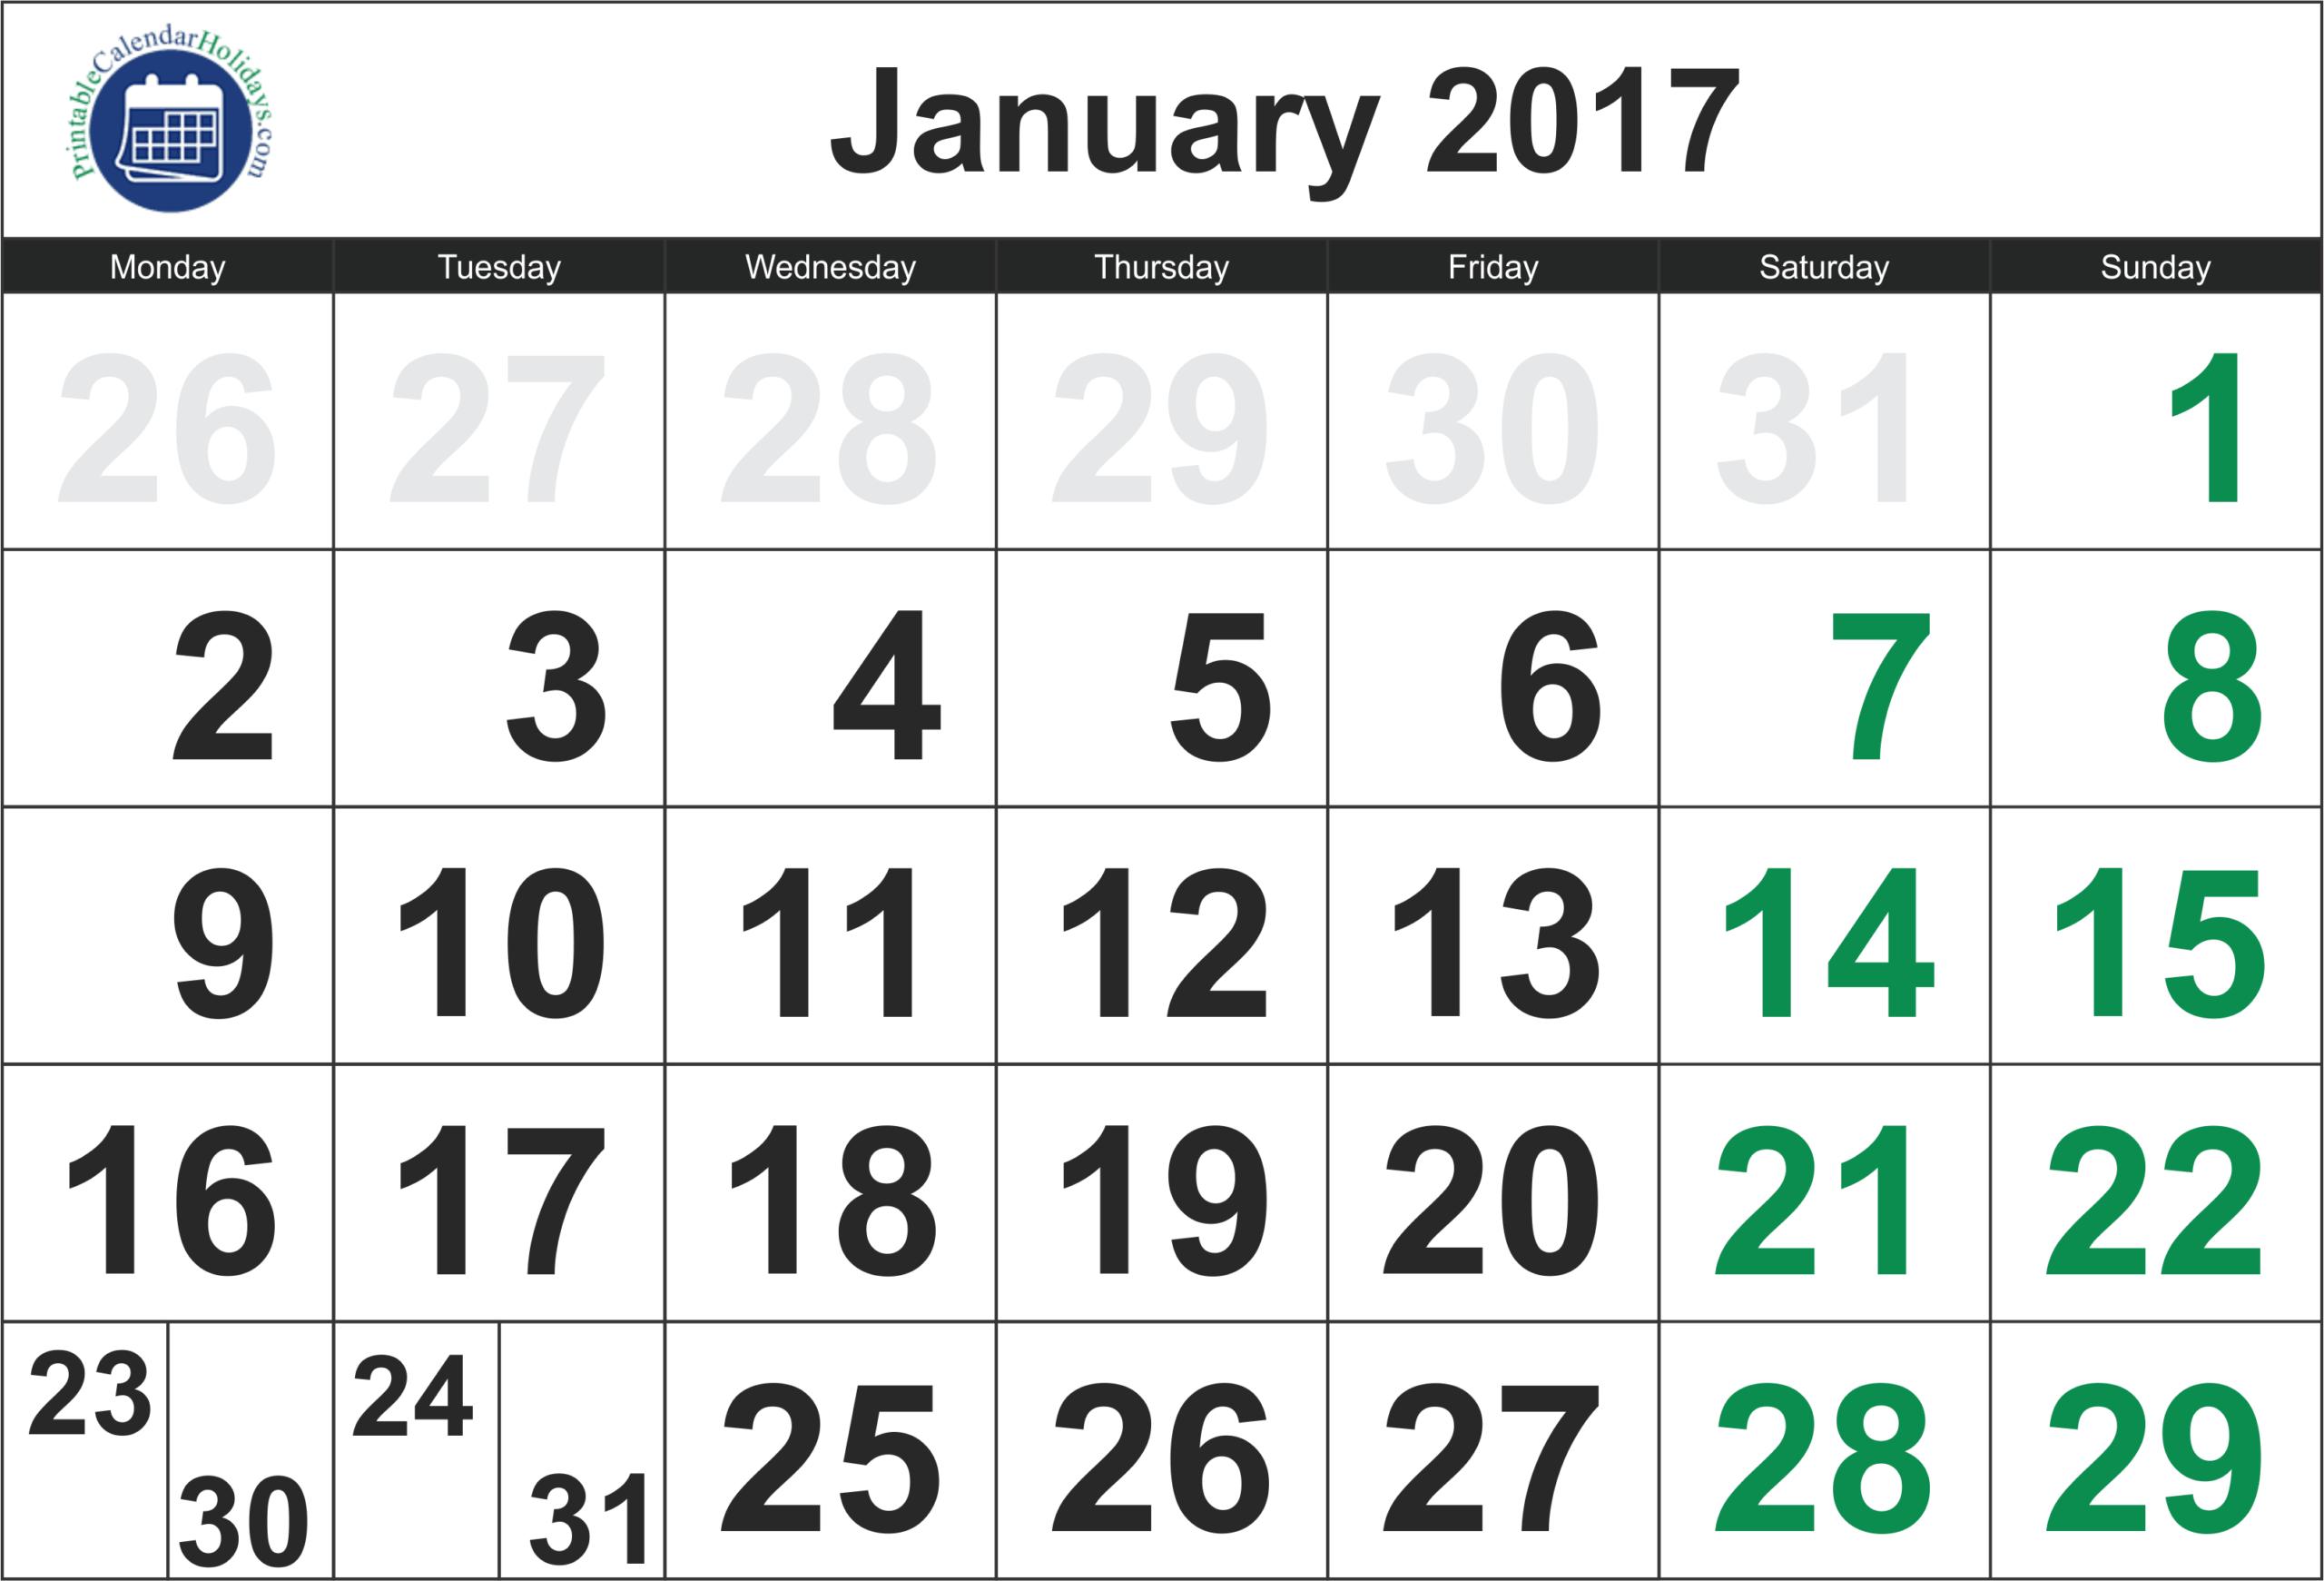 2017 January Calendar - Printable Calendar Template 2020 2021